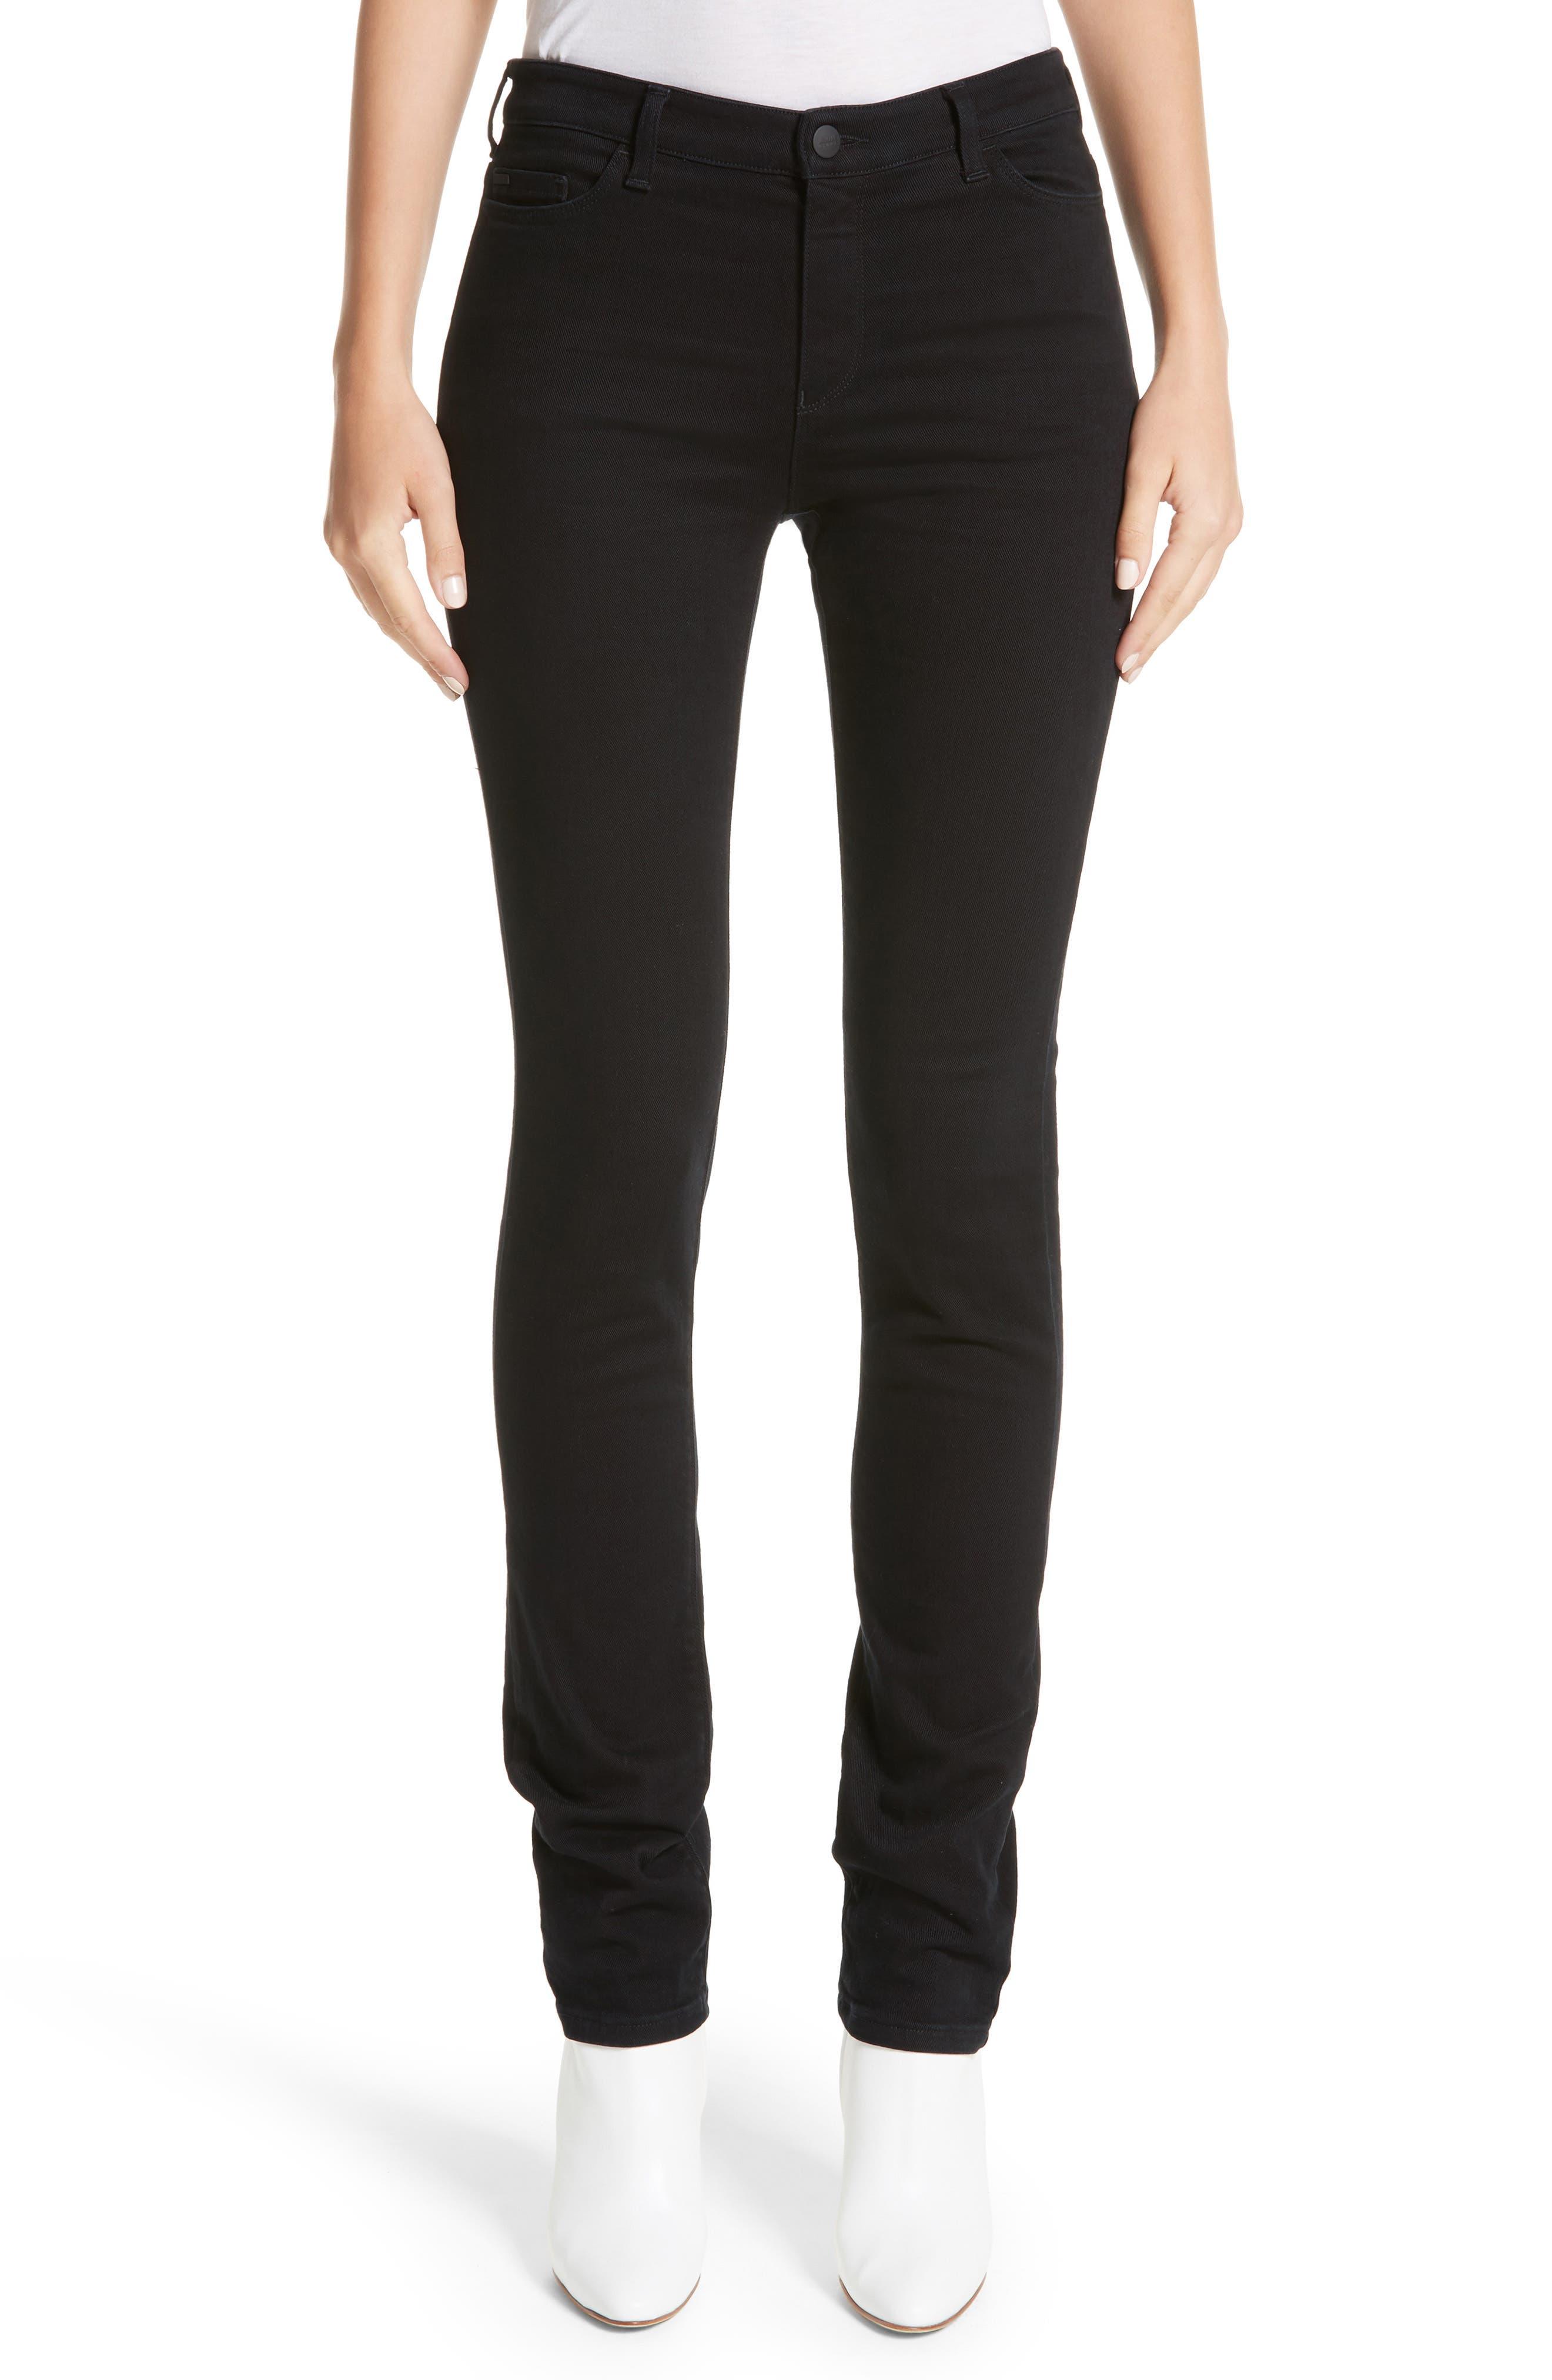 Alternate Image 1 Selected - Armani Collezioni Straight Leg Jeans